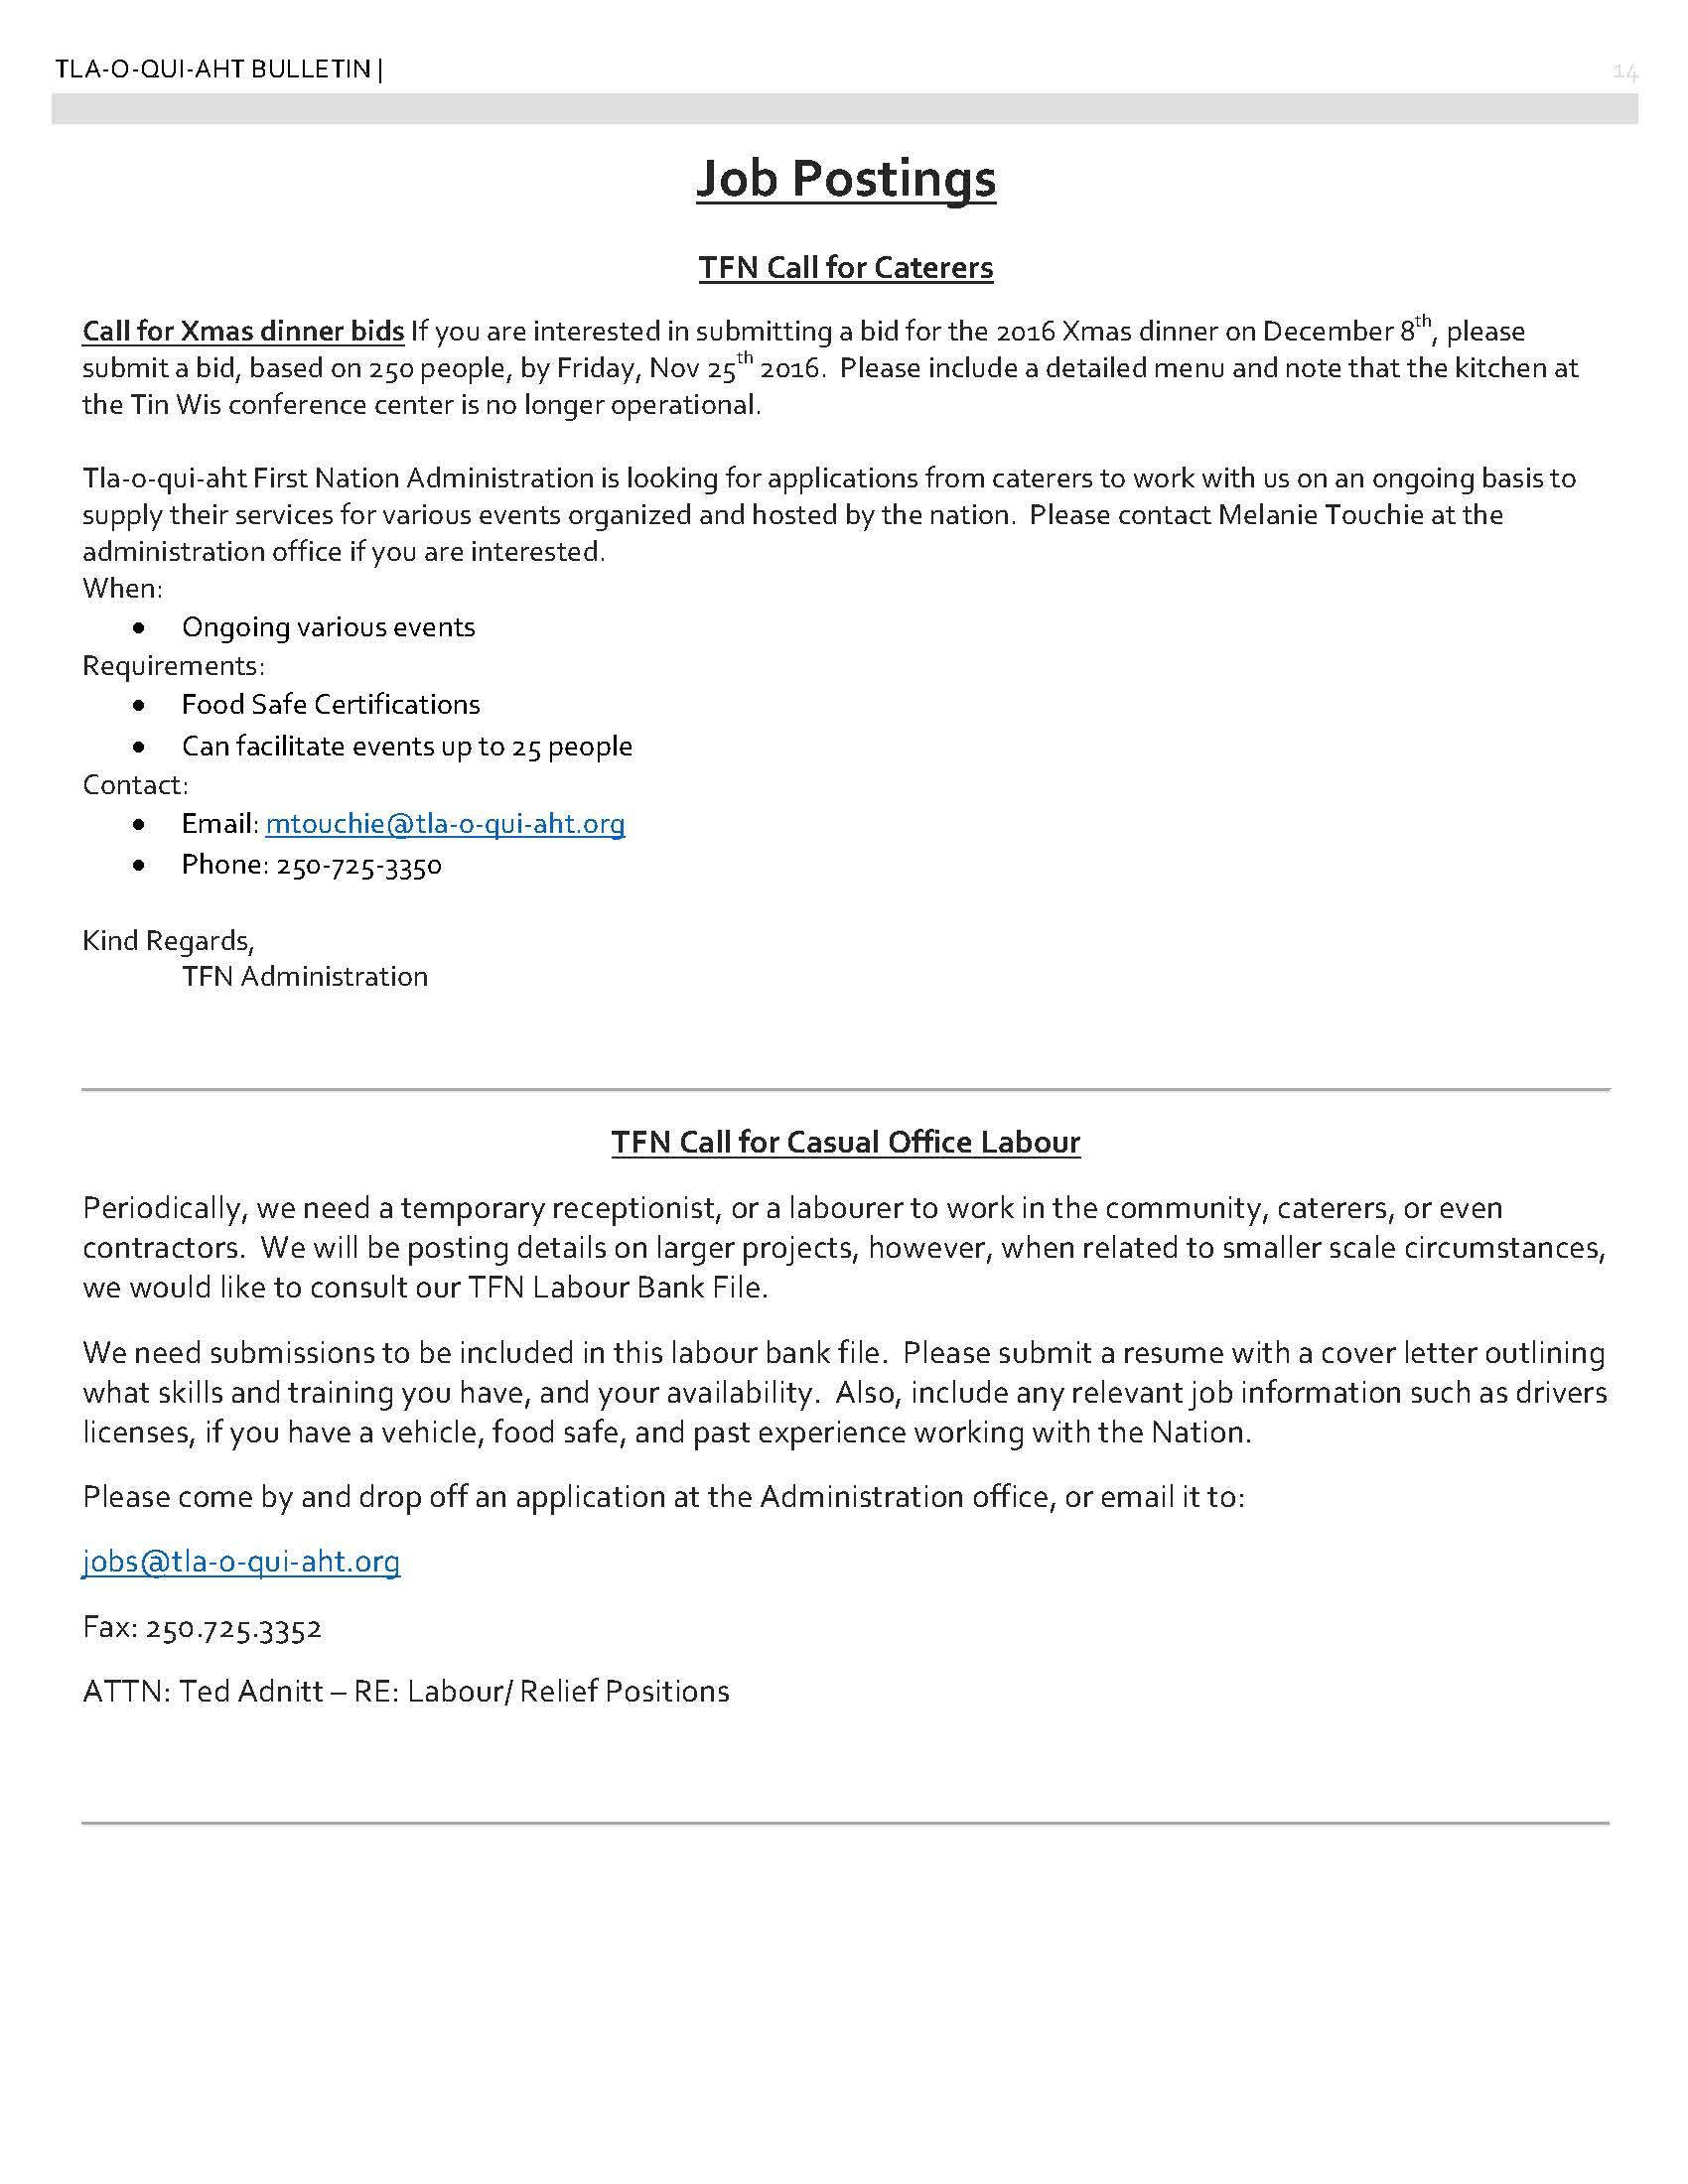 0TFN Bulletin Nov 15-2016_Page_14.jpg